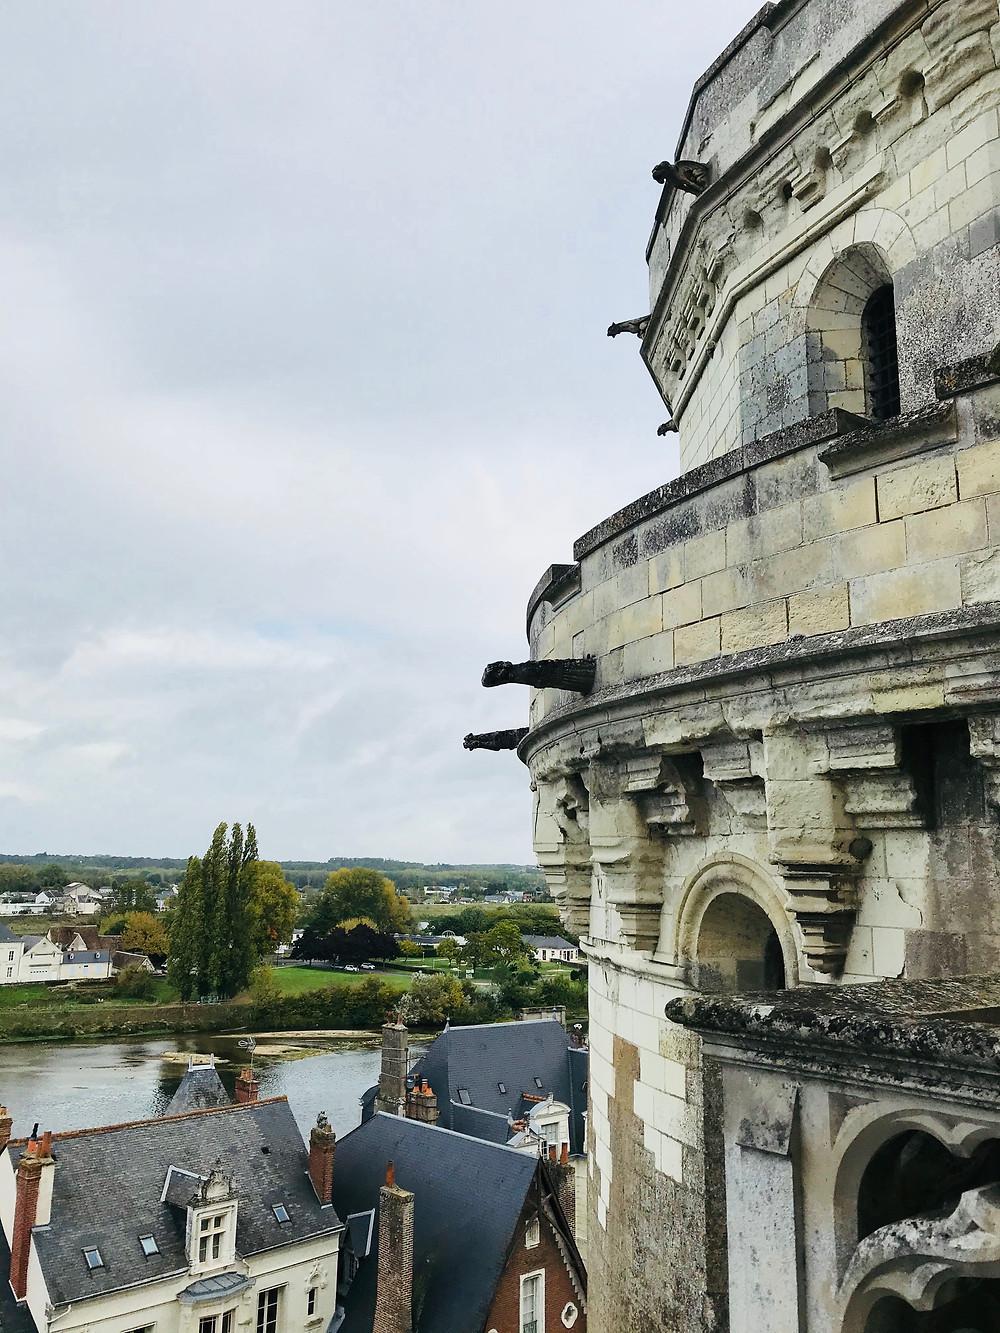 loire-river-chateau-amboise